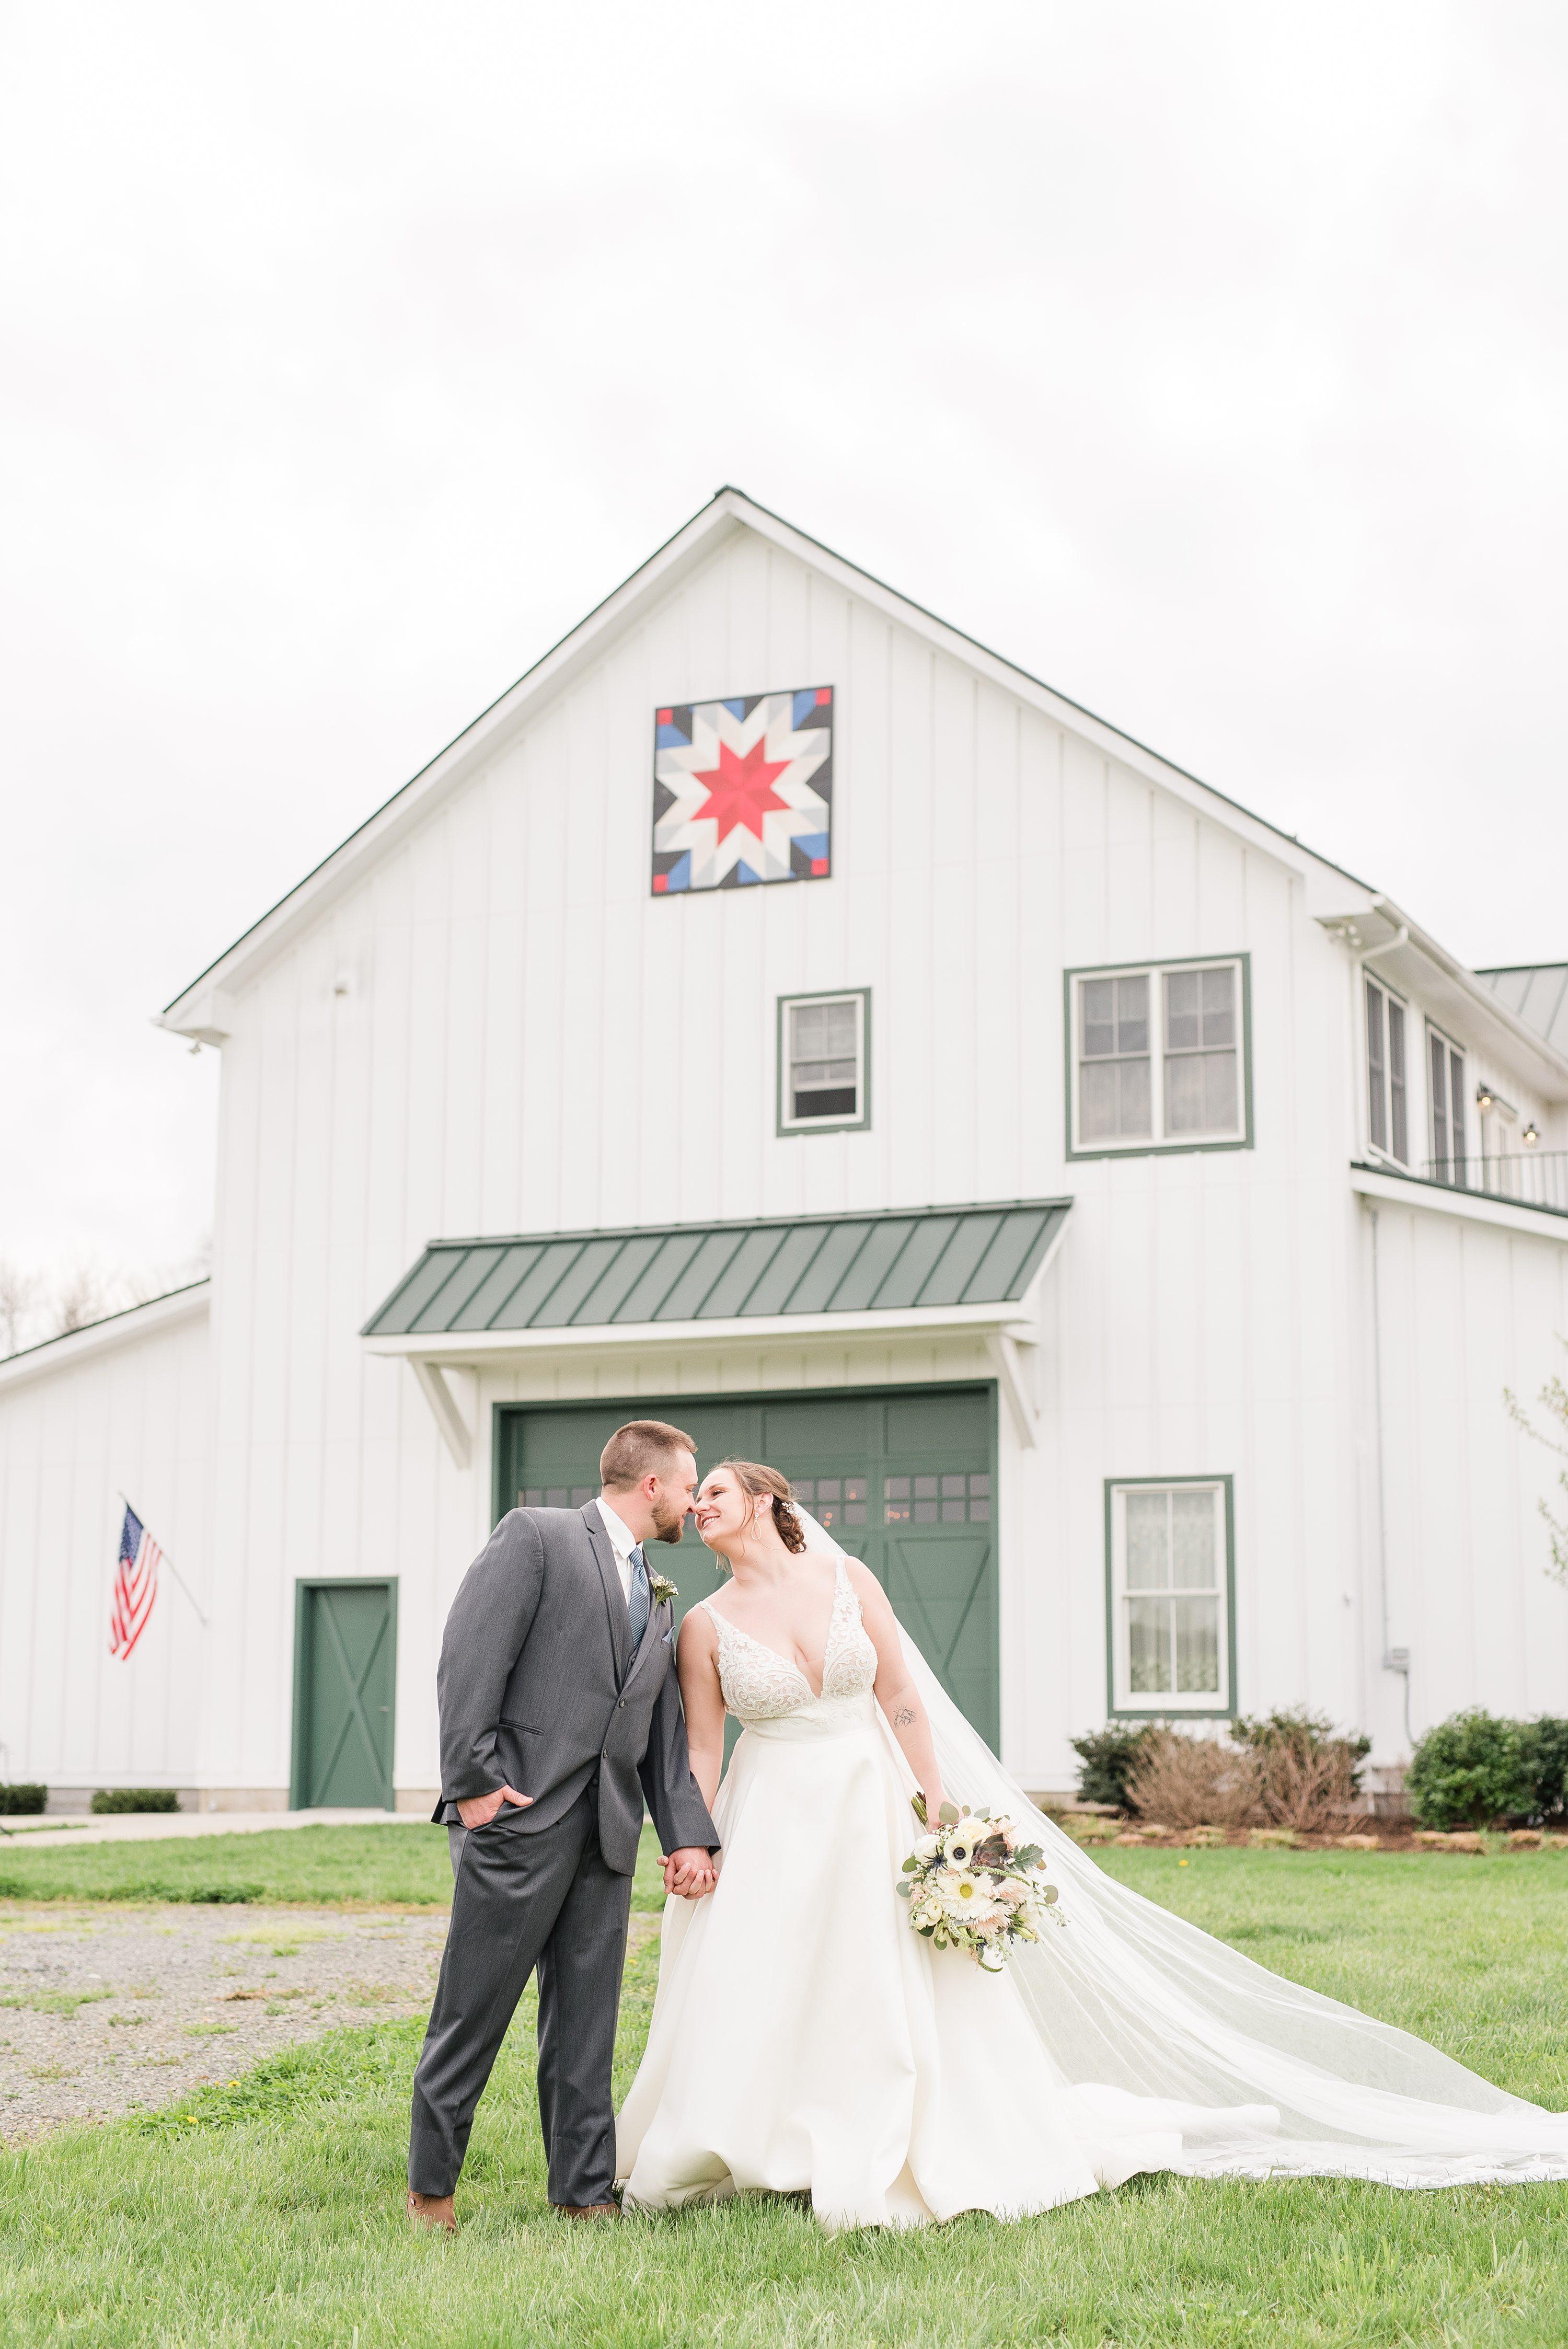 Outdoor Spring Wedding,Blue Ridge Mountains Wedding,bride and groom,mountain wedding,edgewood barn